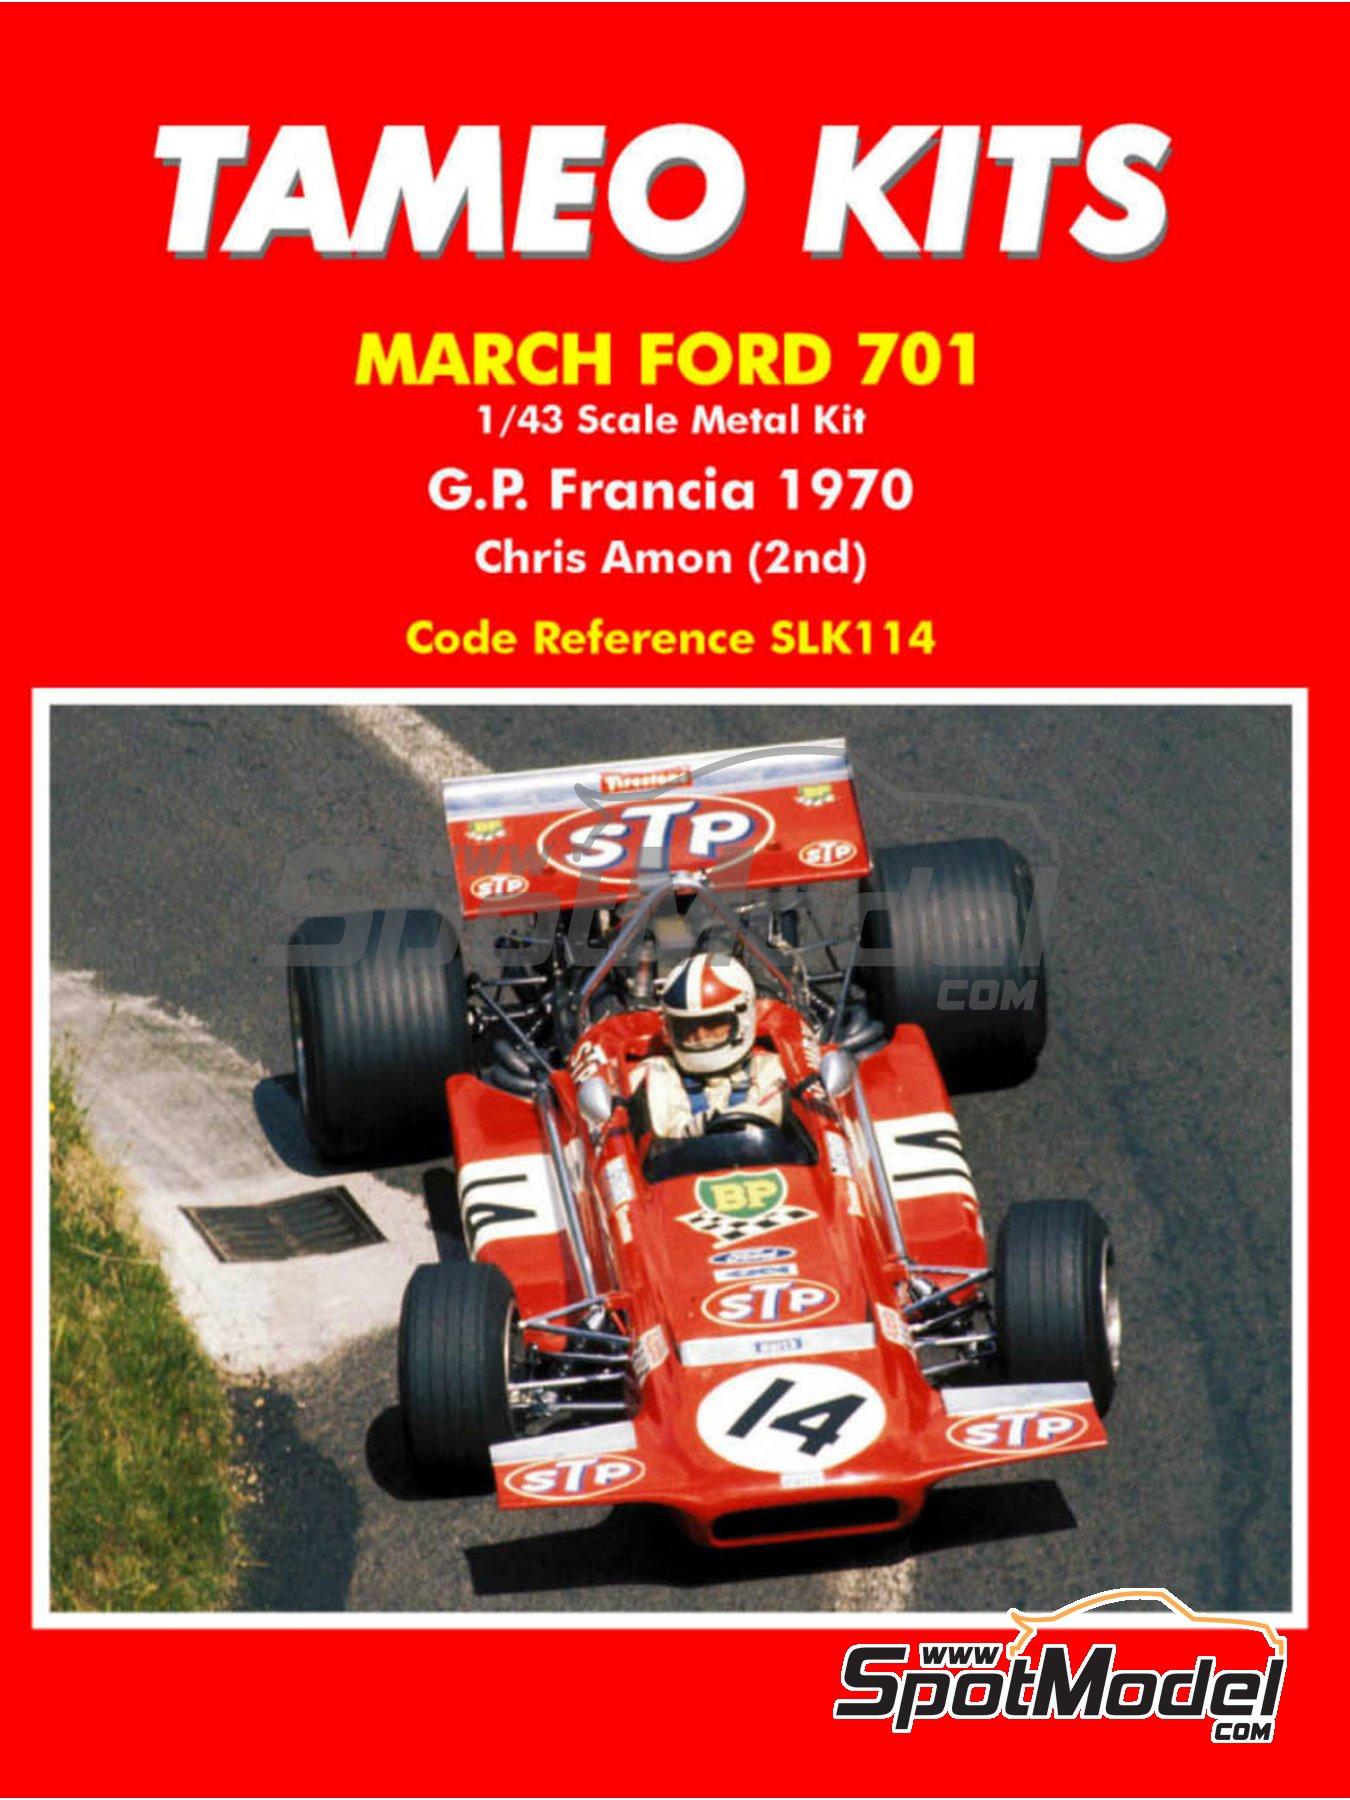 March Ford 701 STP - Gran Premio de Francia 1970 | Maqueta de coche en escala1/43 fabricado por Tameo Kits (ref.SLK114) image